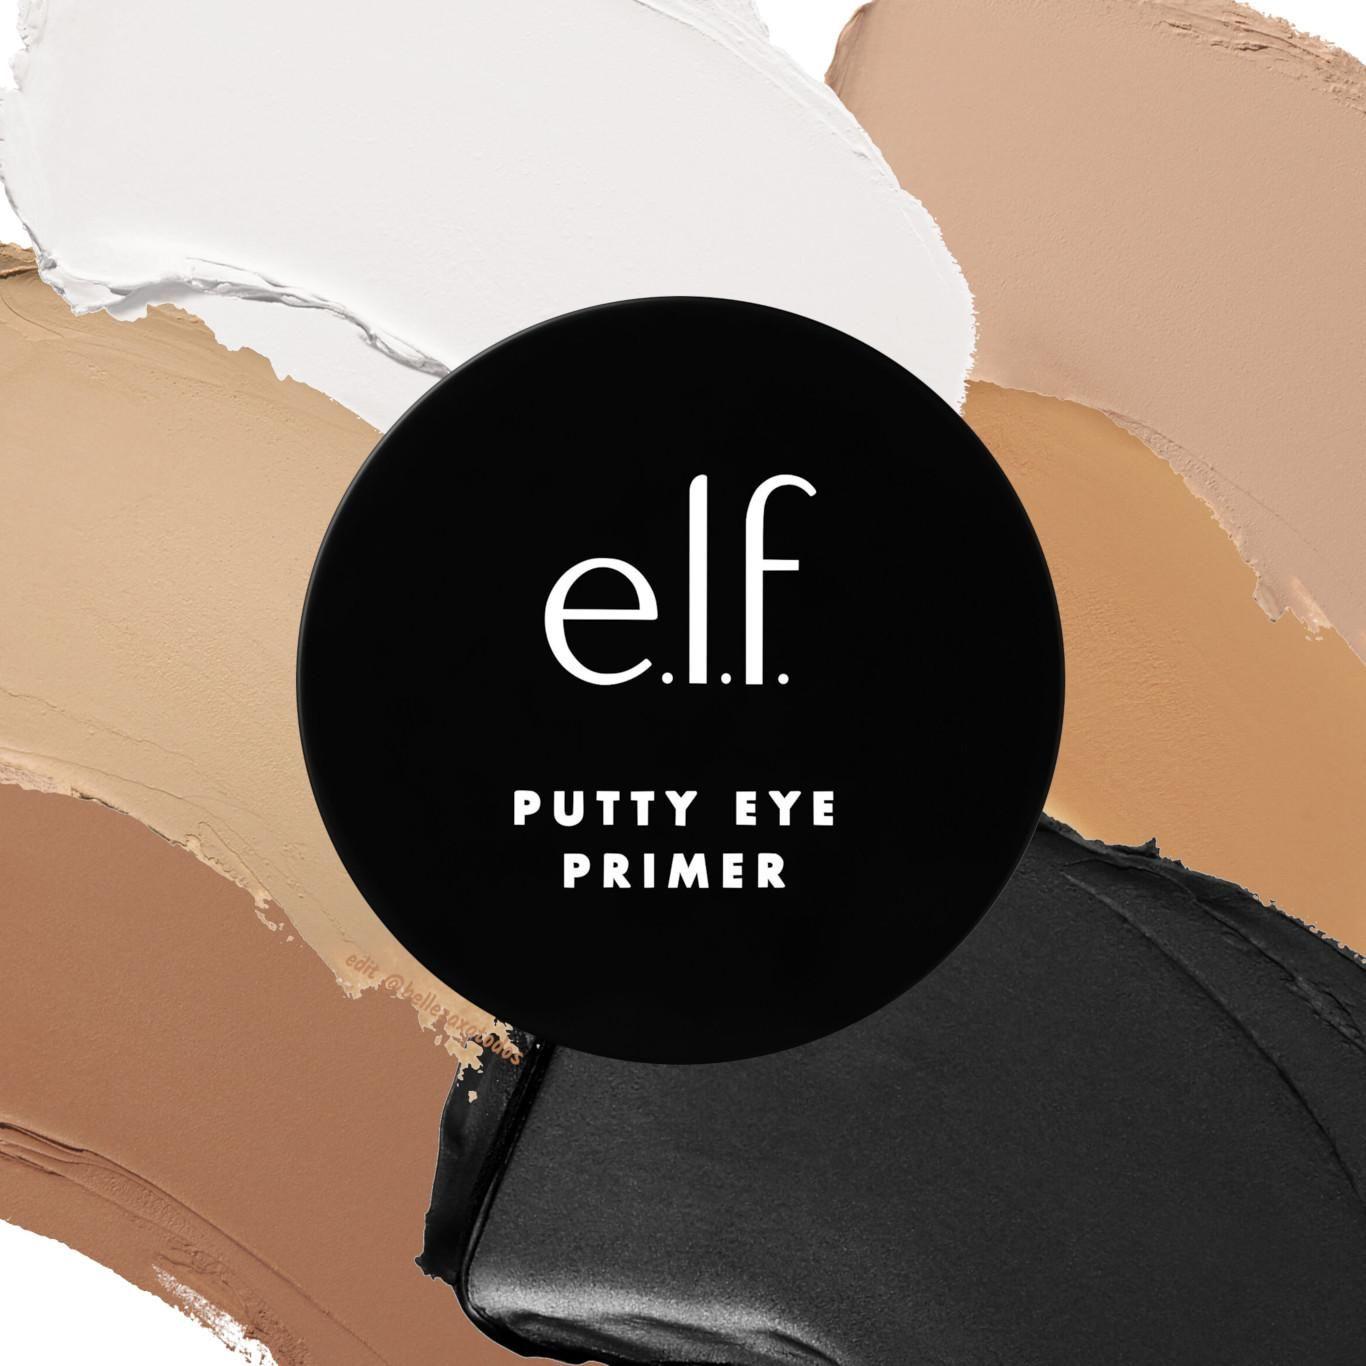 Putty Eye Primer de e.l.f. Cosmetics en 2020 Sombras de